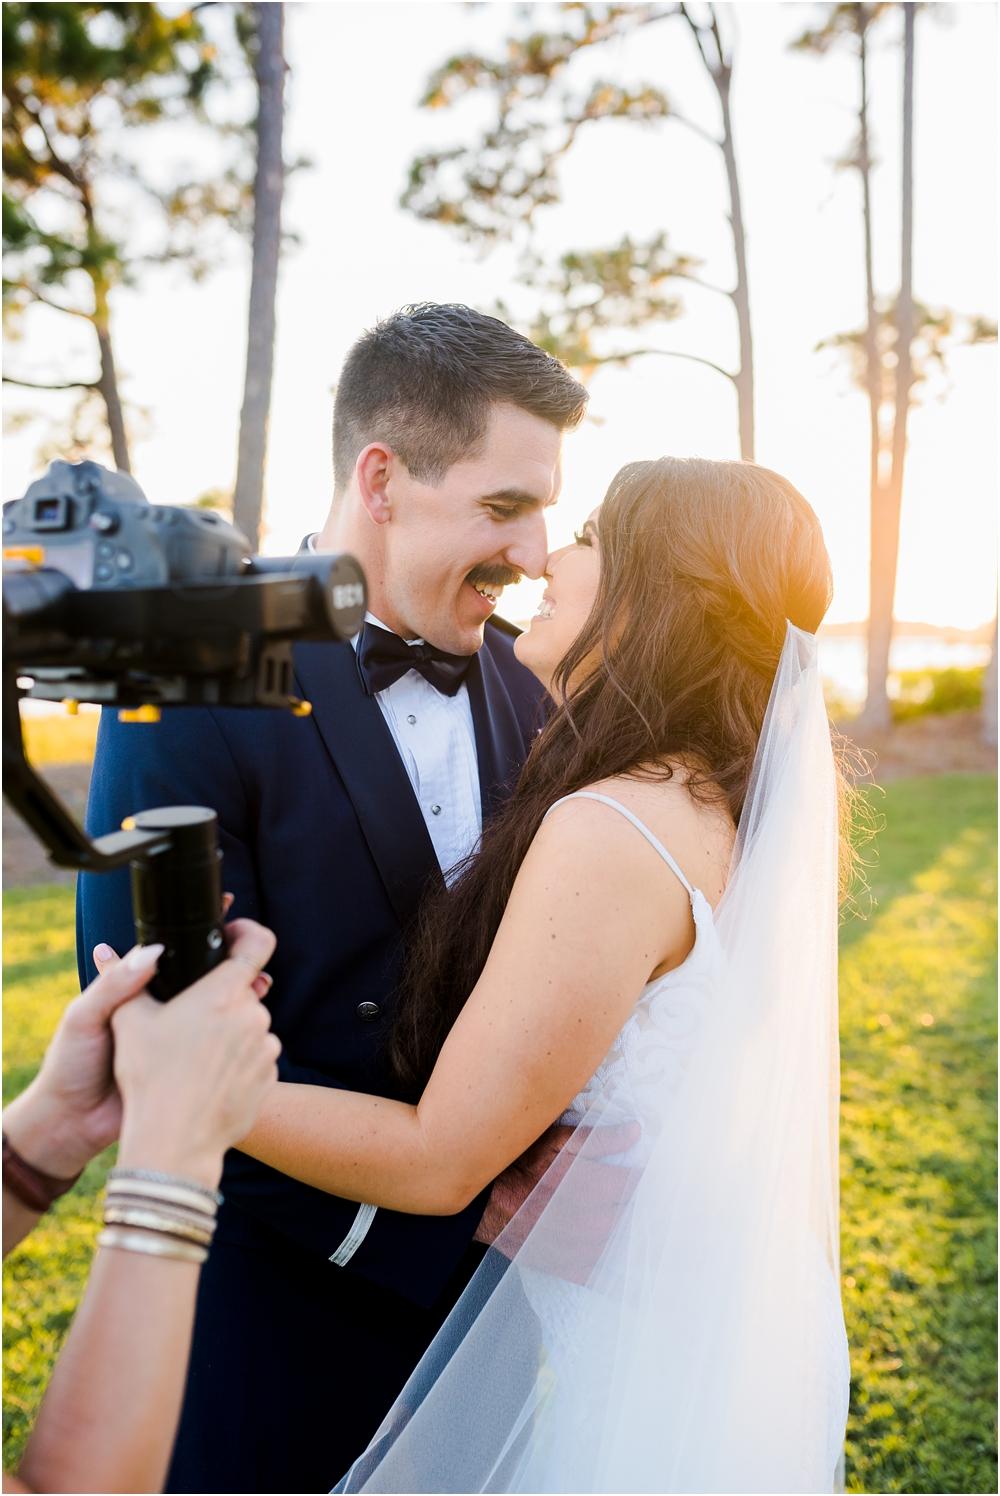 amack-wedding-kiersten-stevenson-photography-30a-panama-city-beach-dothan-tallahassee-(512-of-882).JPG